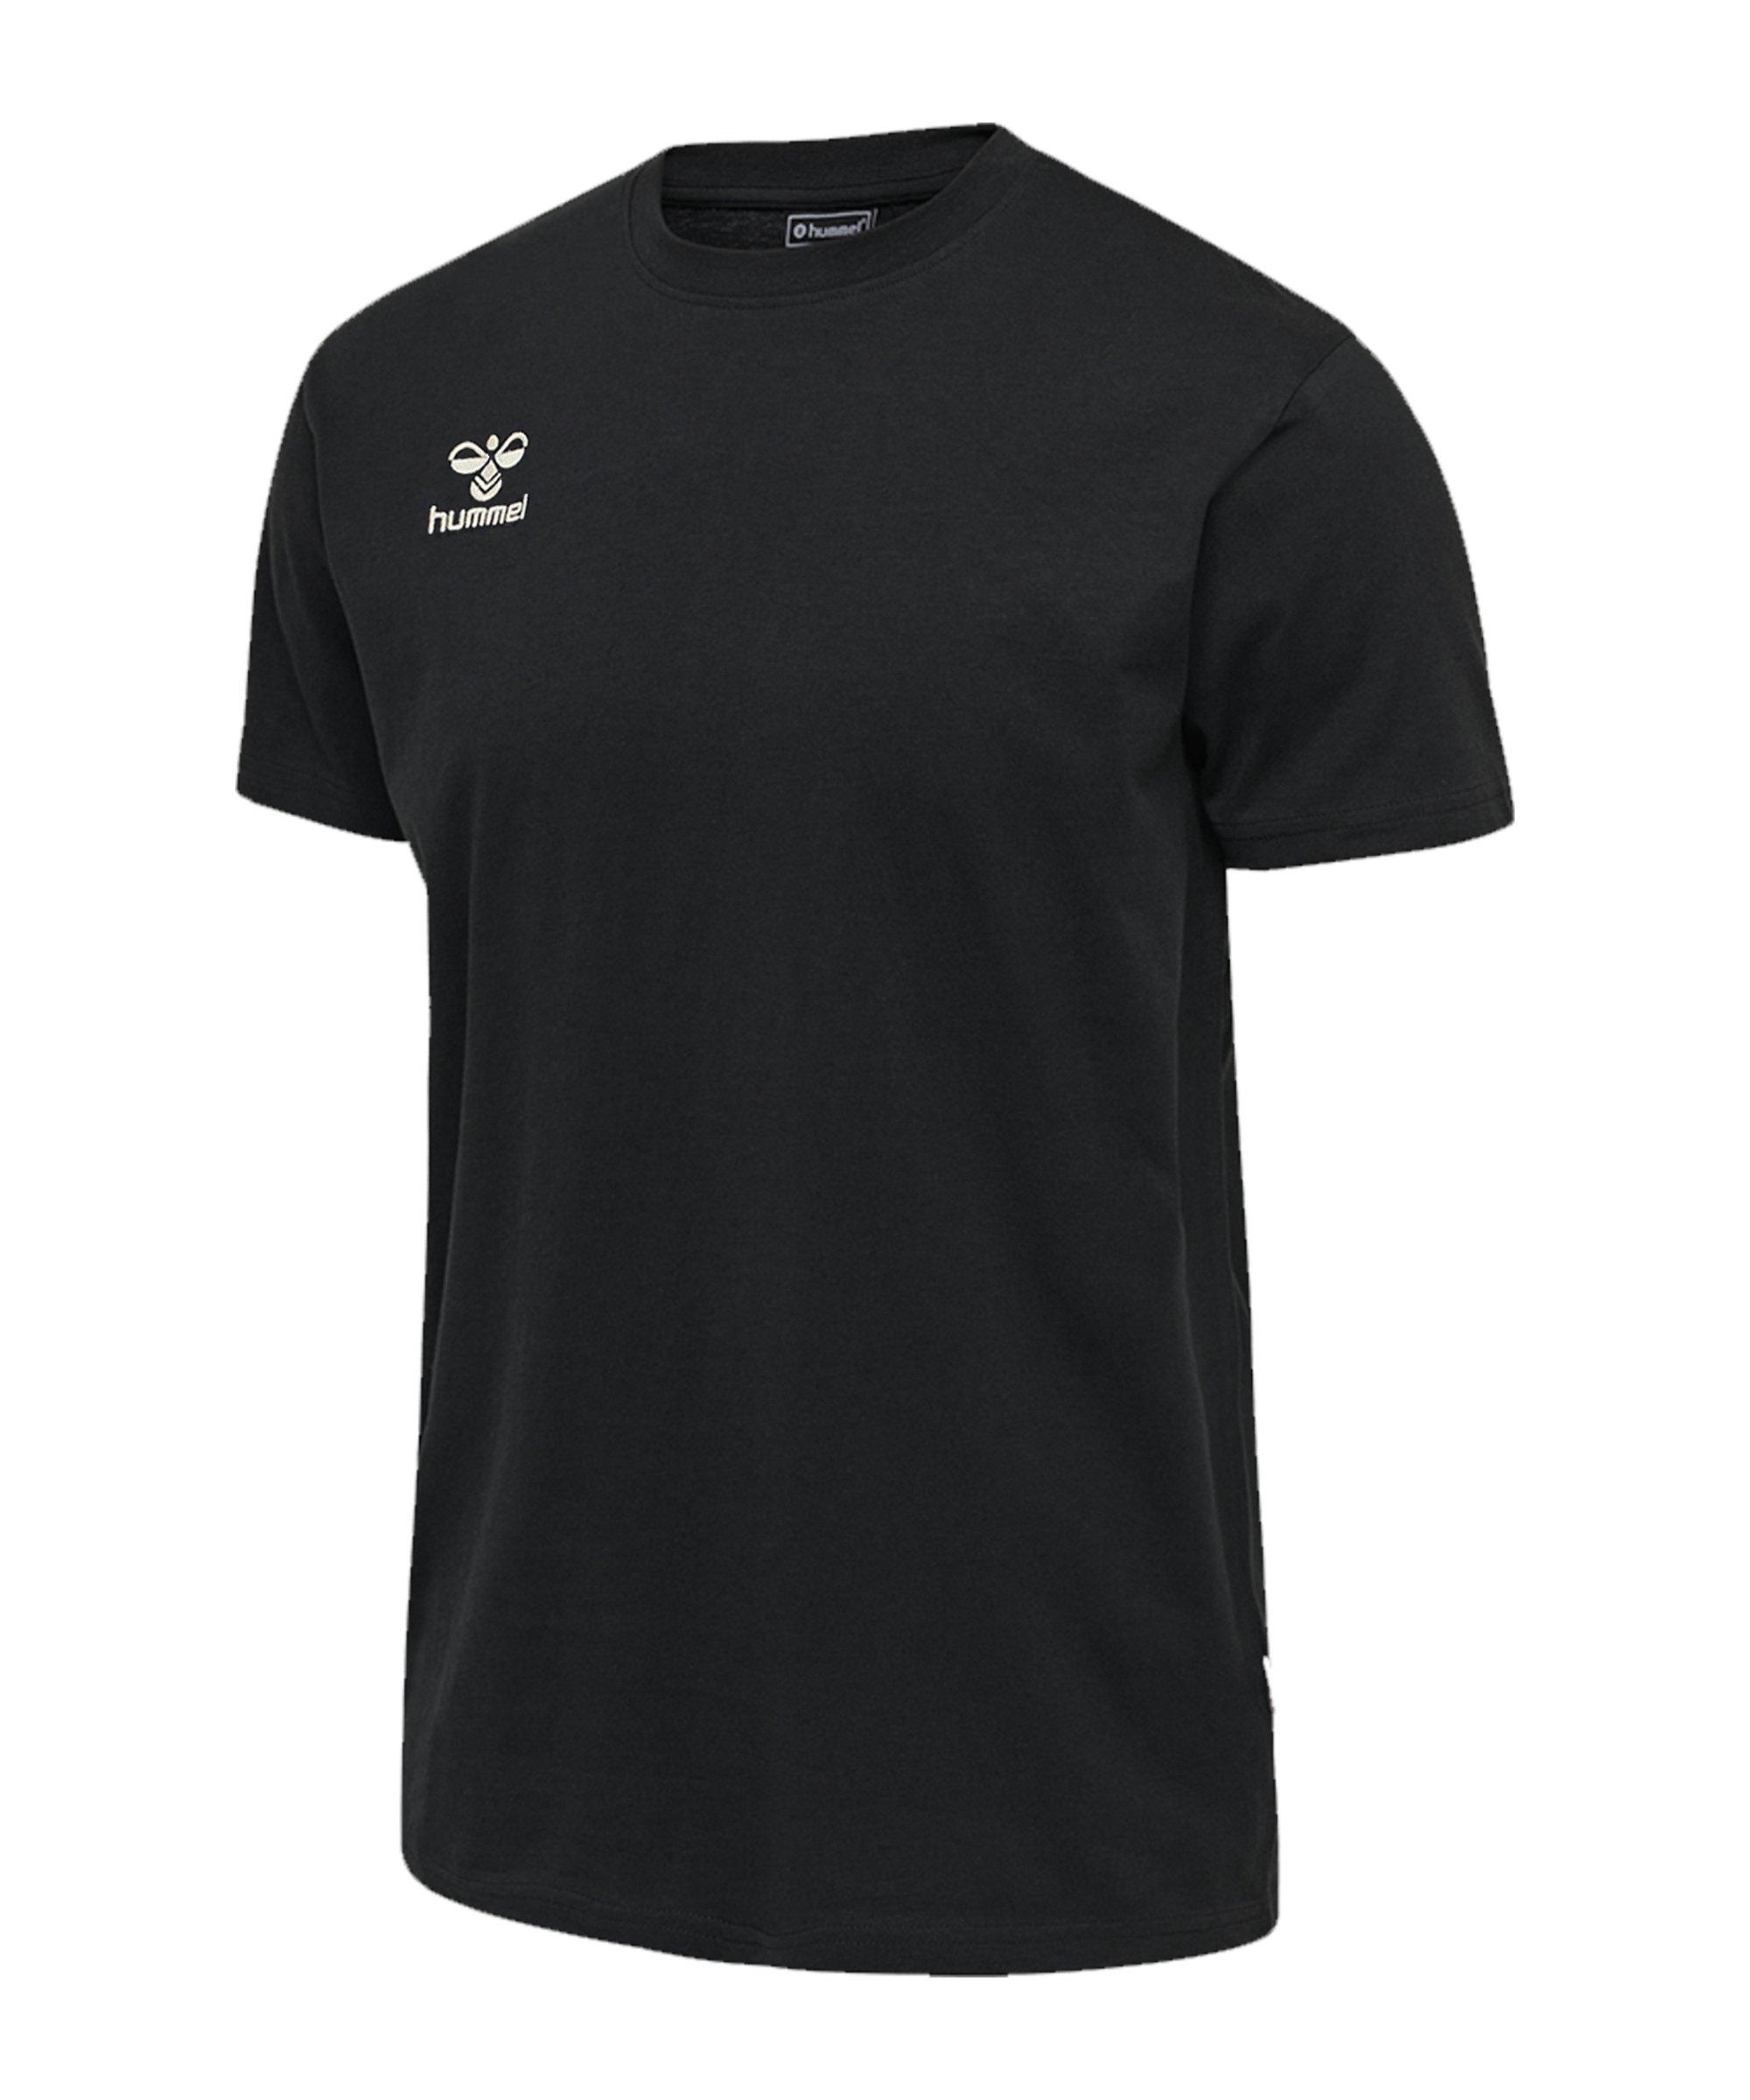 Hummel Move T-Shirt Schwarz F2001 - Schwarz